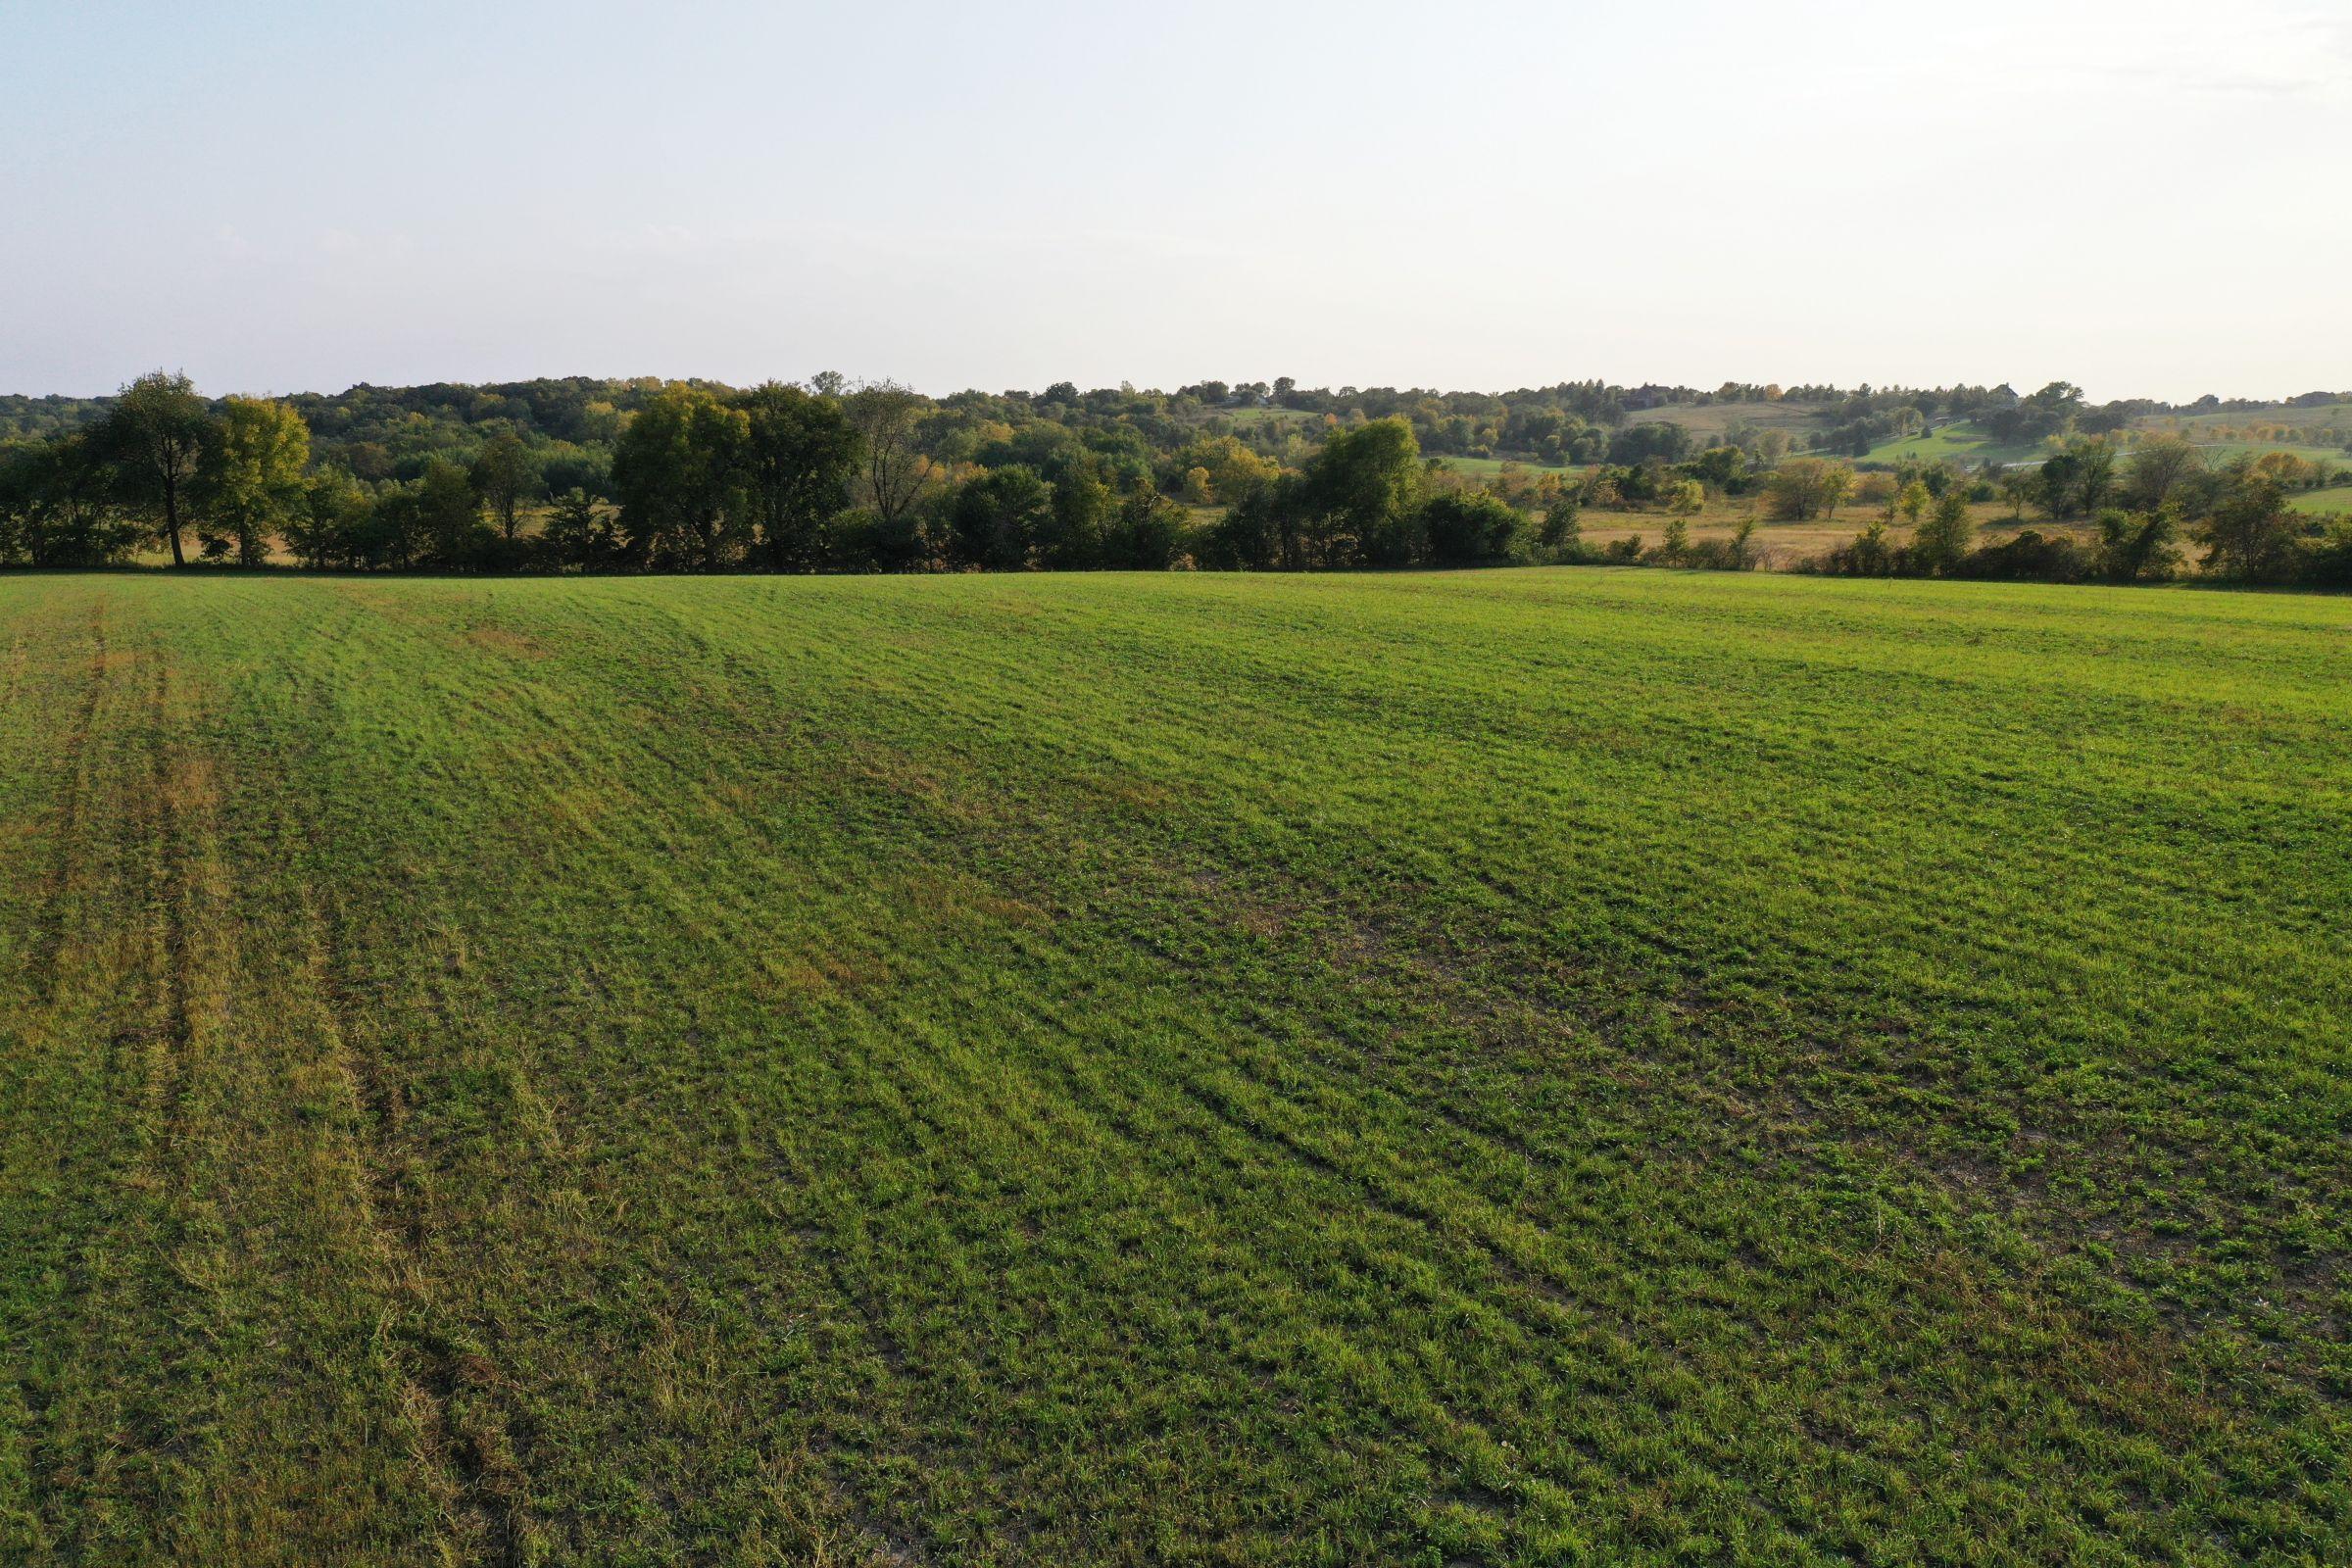 land-warren-county-iowa-29-acres-listing-number-14919-5-2020-10-12-170356.jpg